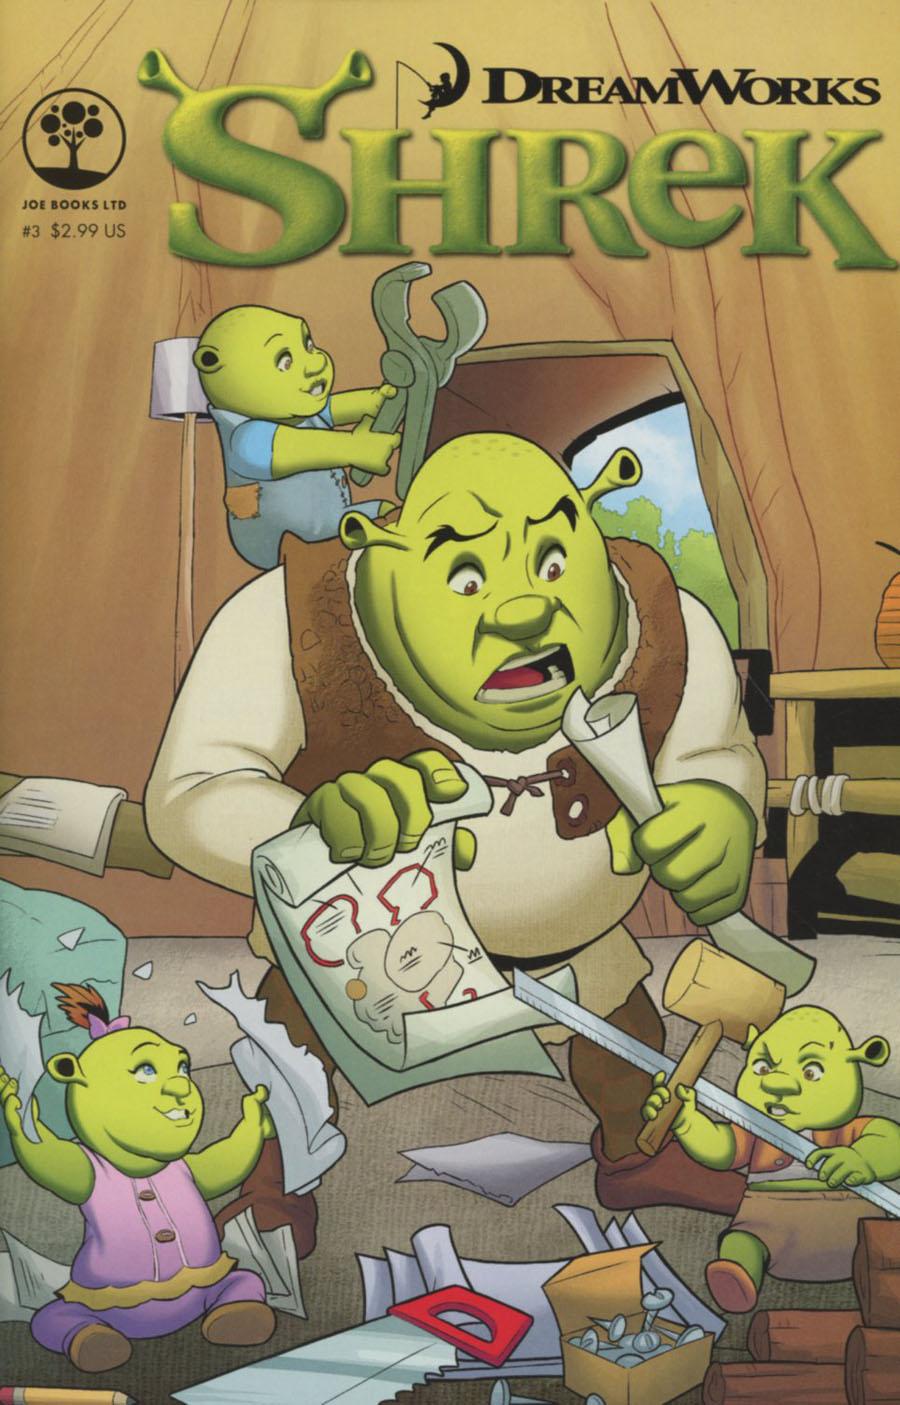 Dreamworks Shrek #3